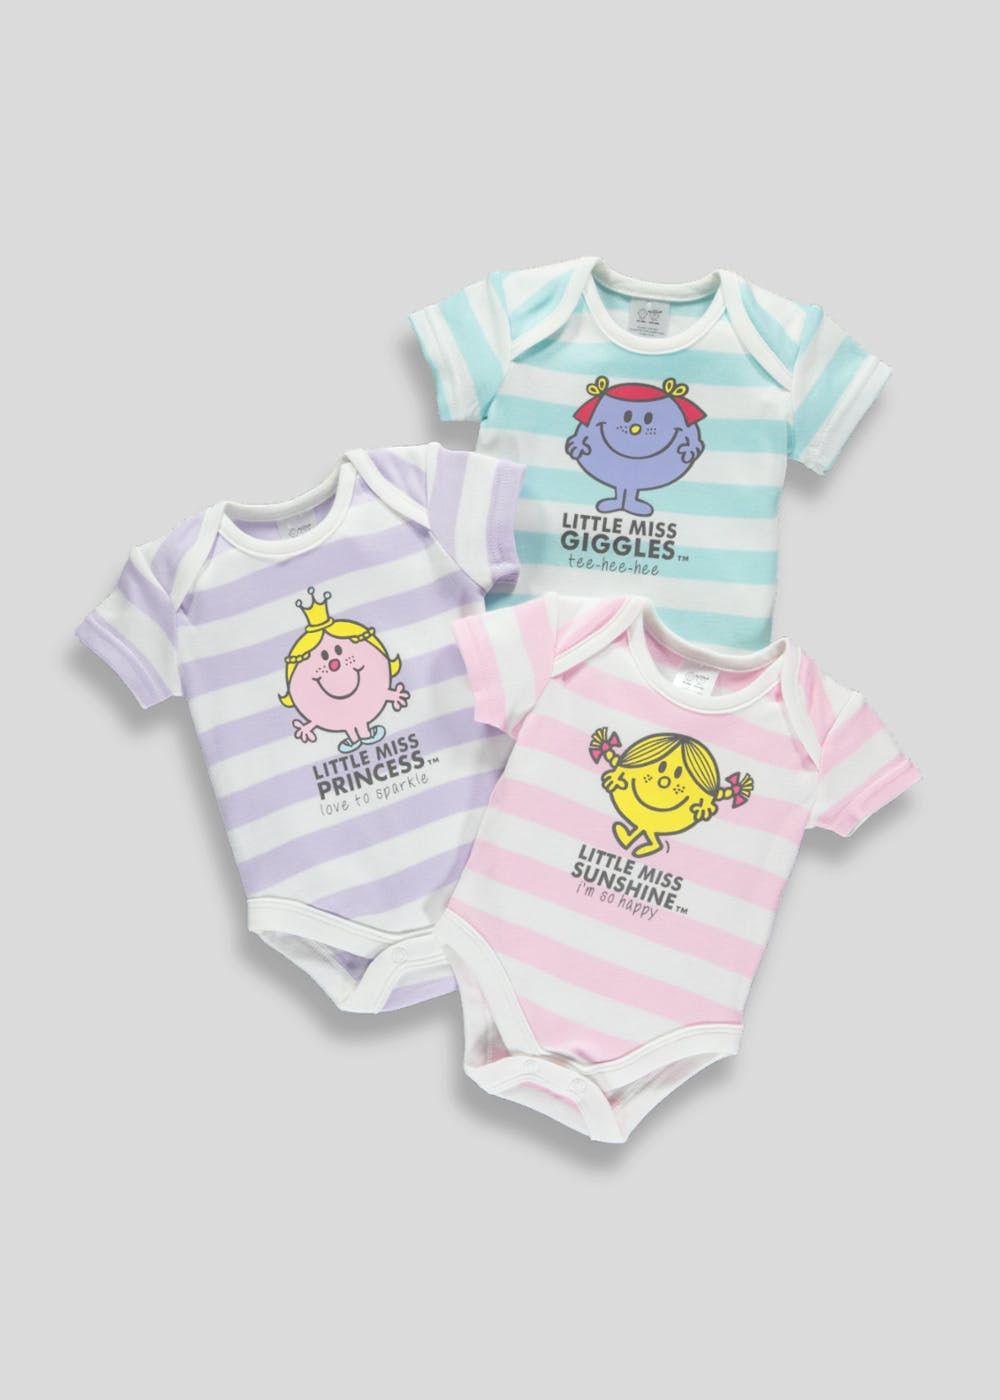 d6021f0f7461 Unisex 3 Pack Little Miss Bodysuits (Newborn-12mths) – Multi